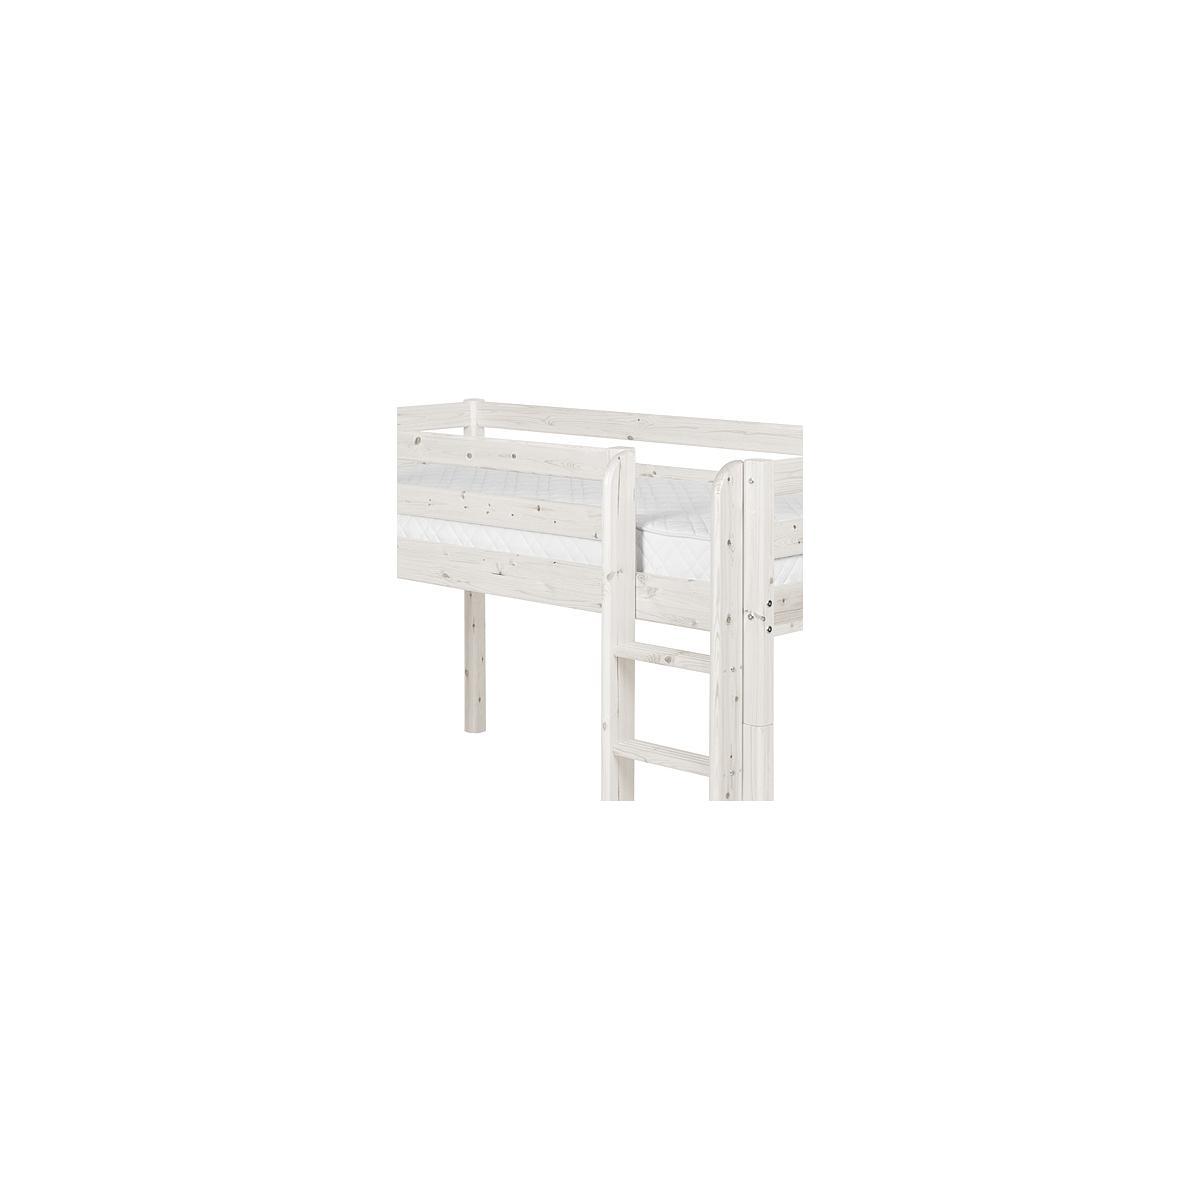 Cama media alta 90x200 CLASSIC Flexa escalera recta tobogán blanco cal